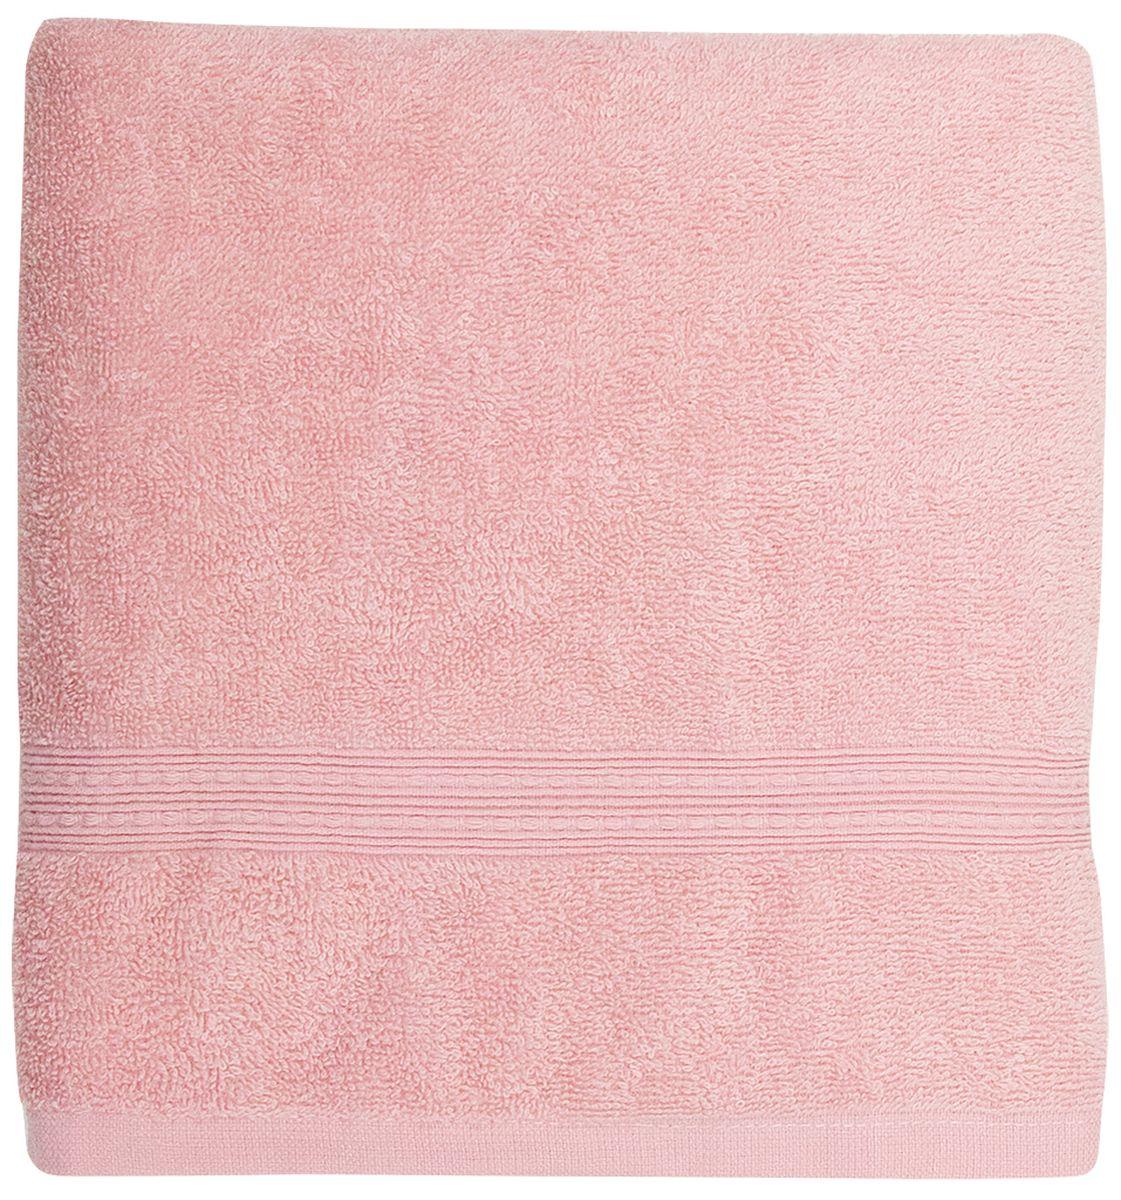 Полотенце банное Bonita Classic, махровое, цвет: роза, 50 x 90 см10503Полотенце банное 50*90 Bonita Classic, махровое